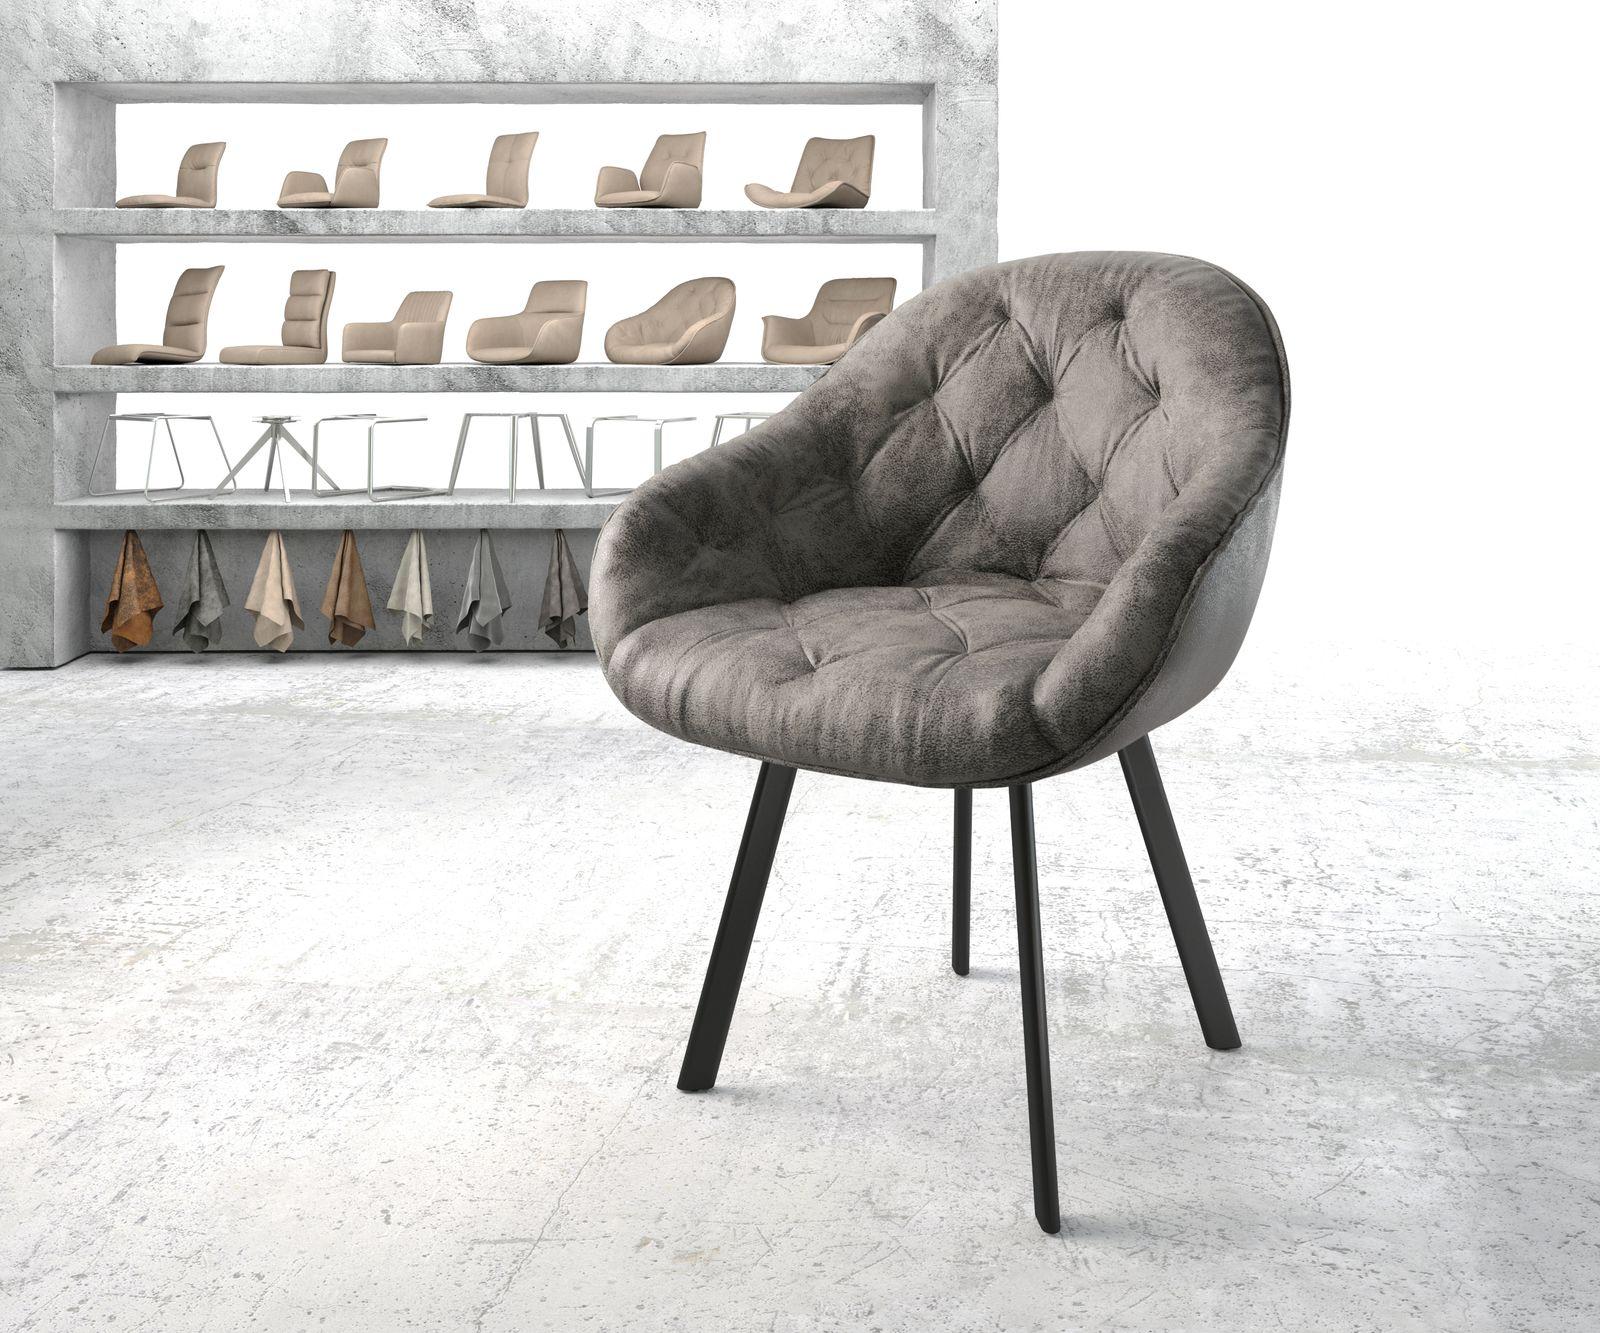 delife-armlehnstuhl-gaio-flex-grau-vintage-4-fu-oval-schwarz-esszimmerstuhle